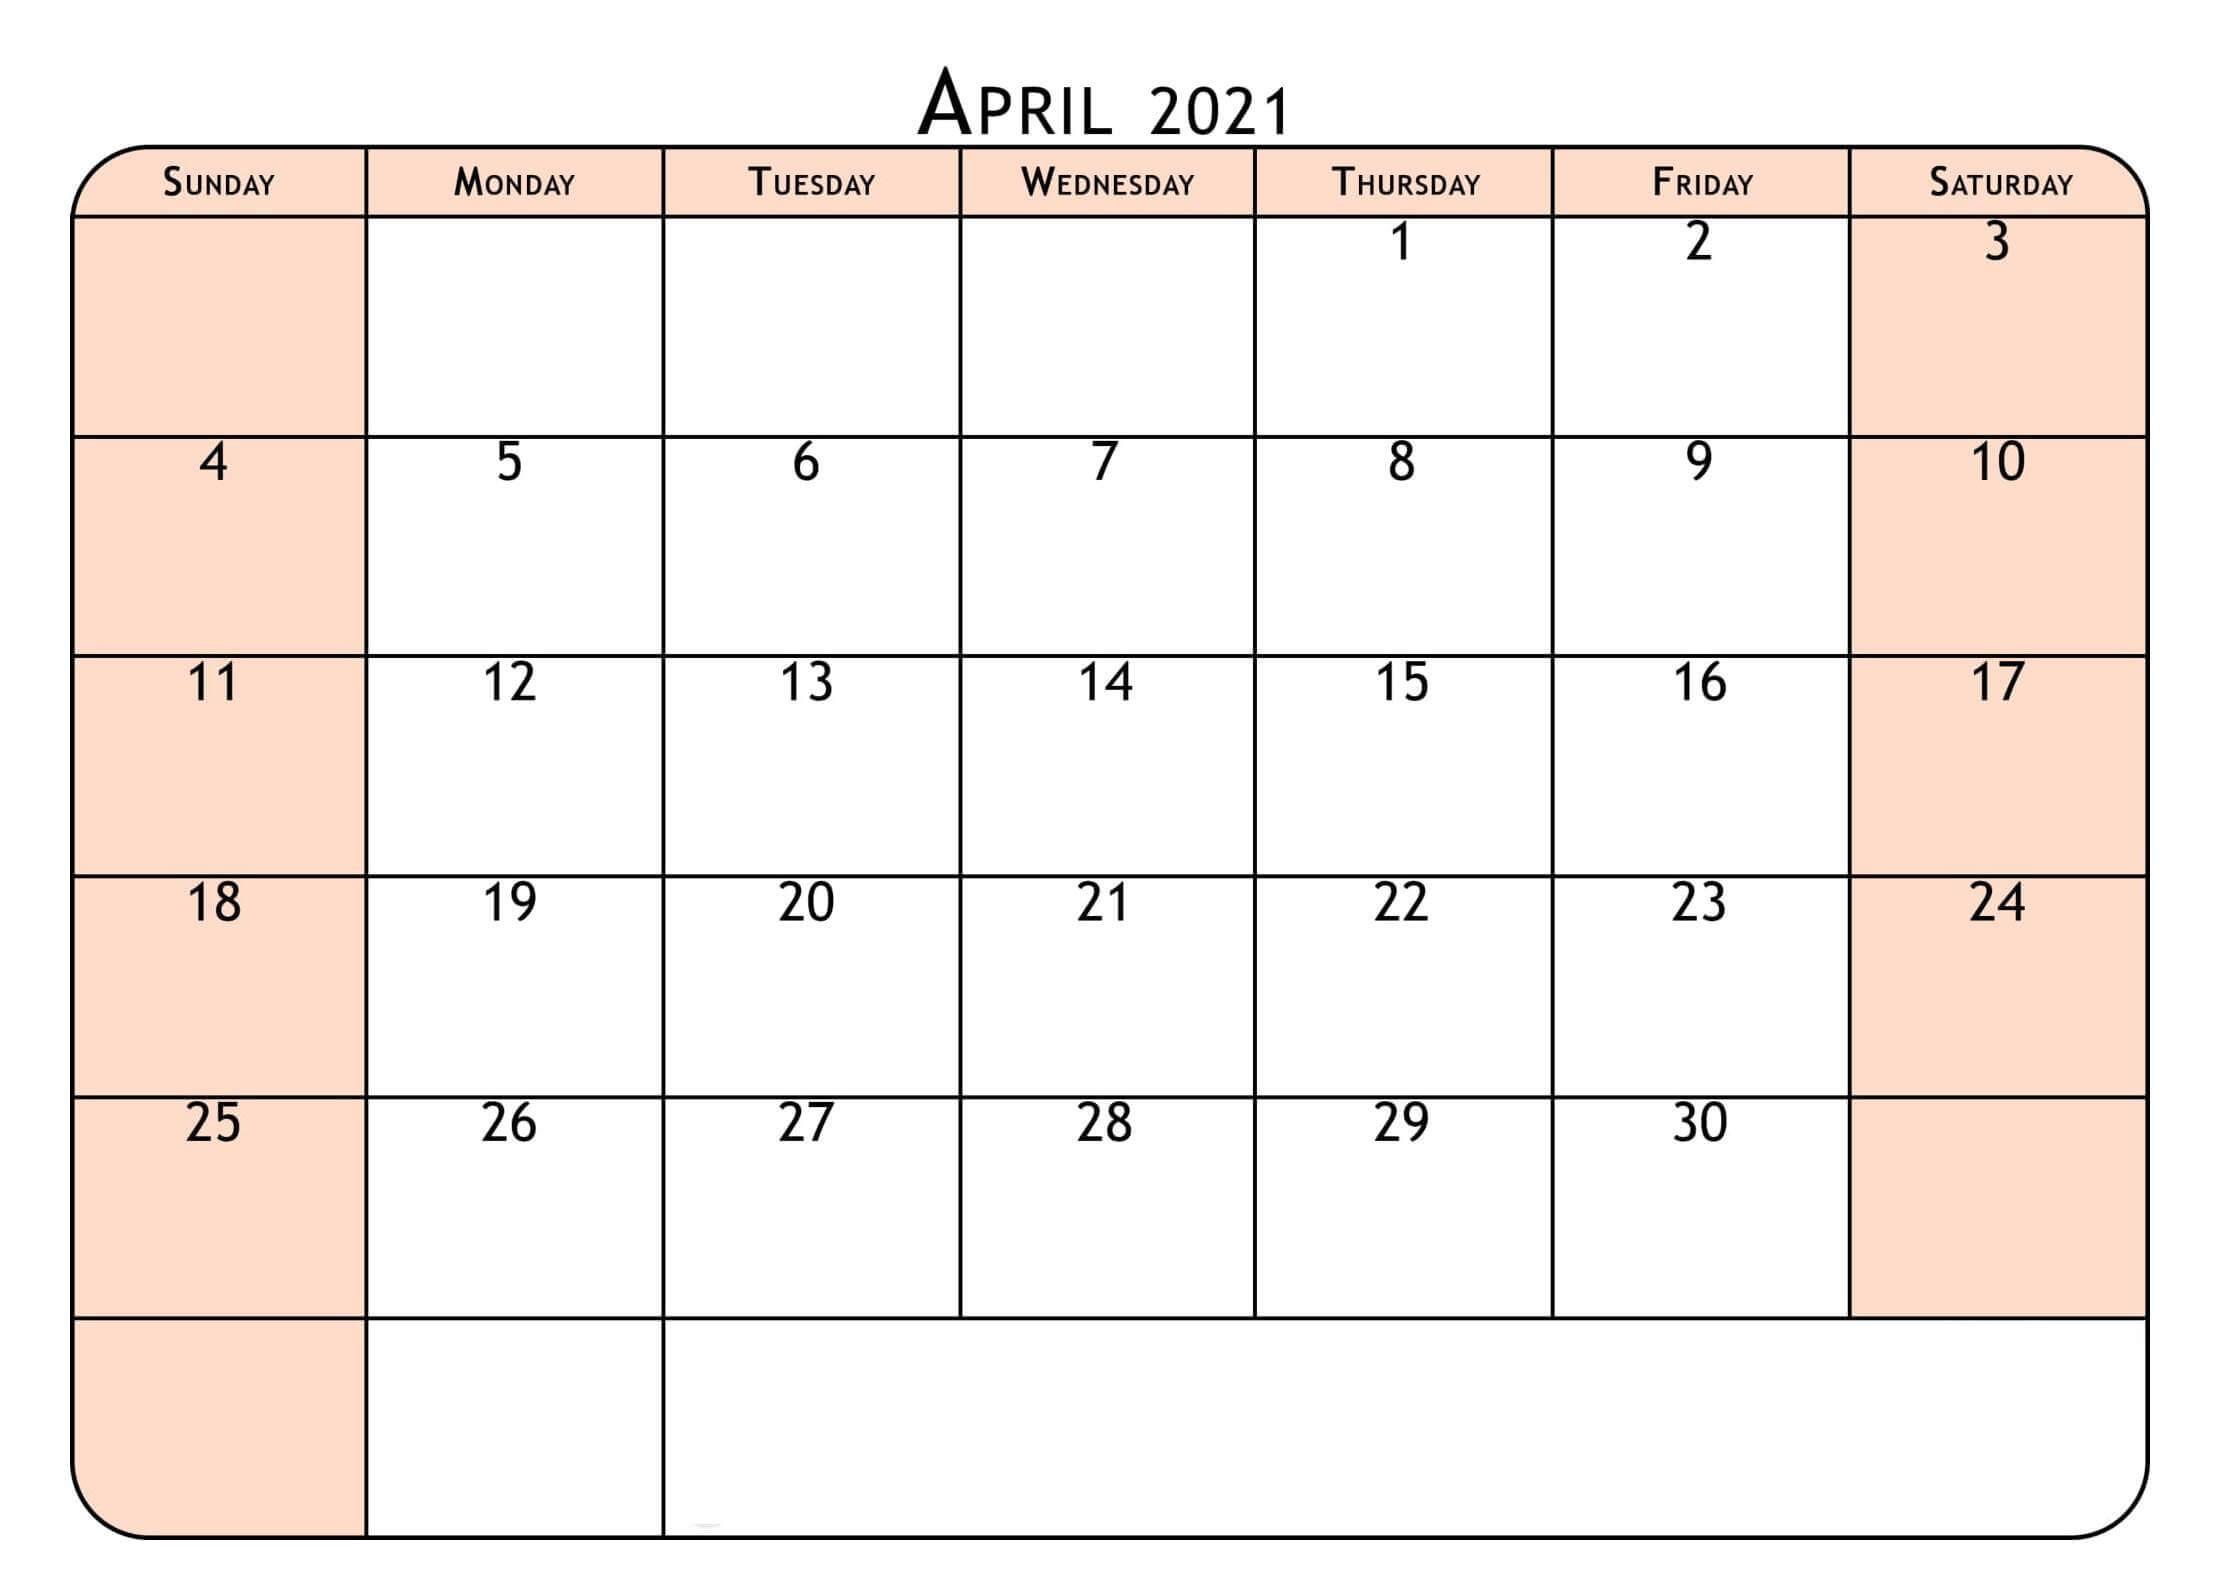 Free Printable April 2021 Calendar Notes Templates - One